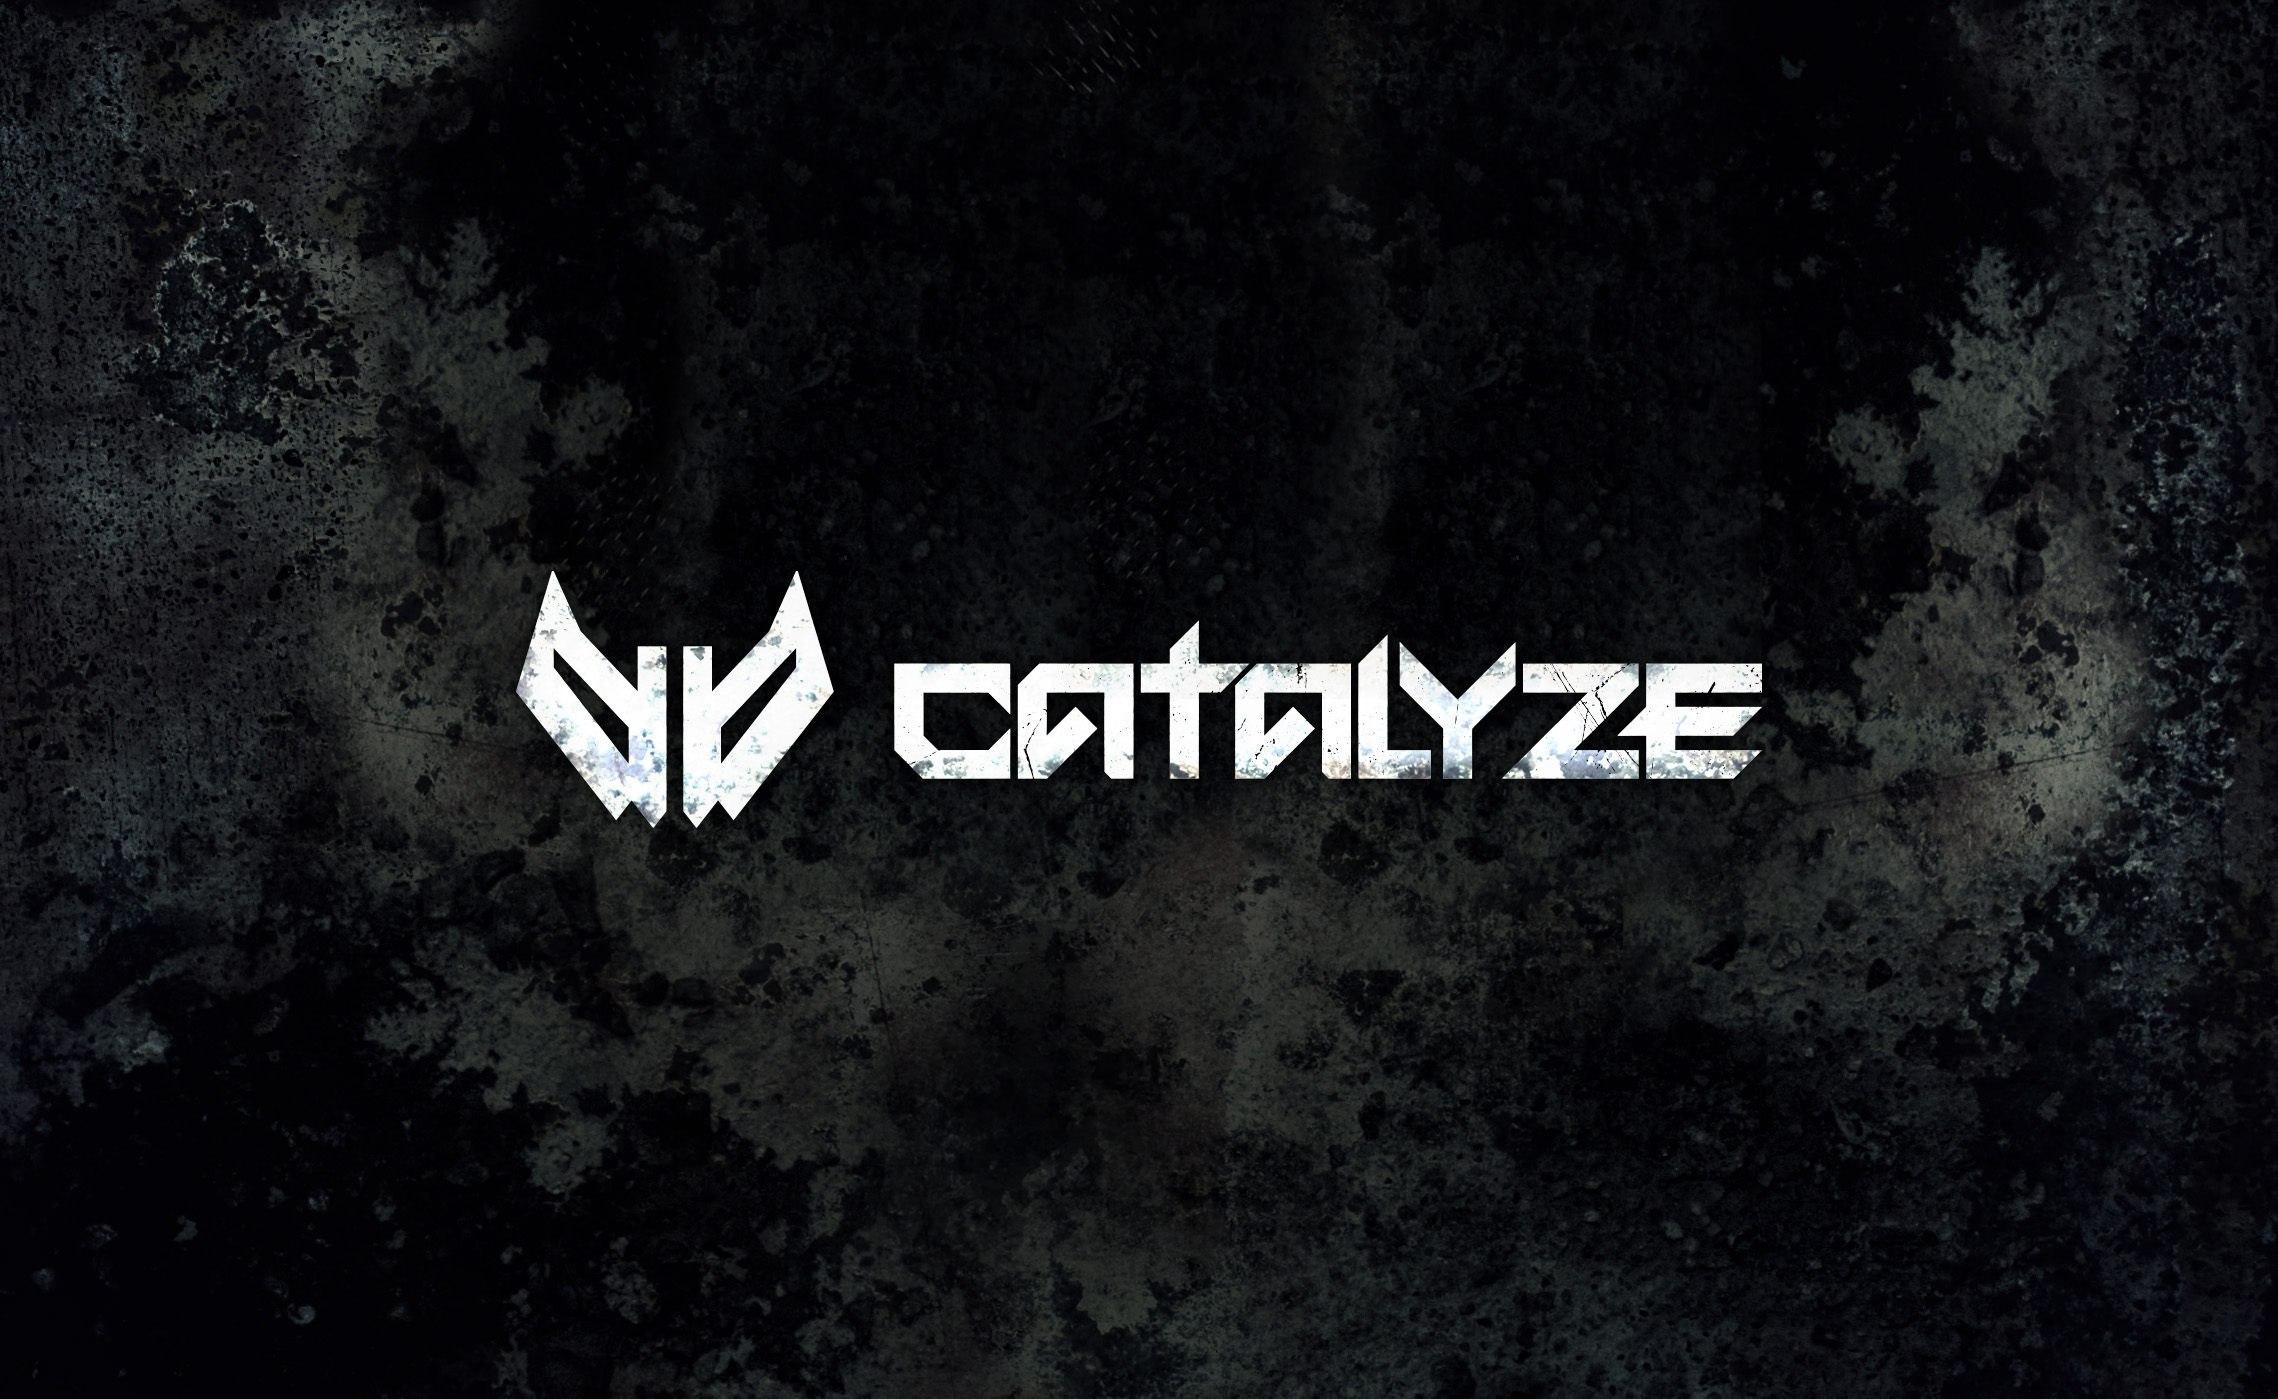 Catalyze_Wallpaper